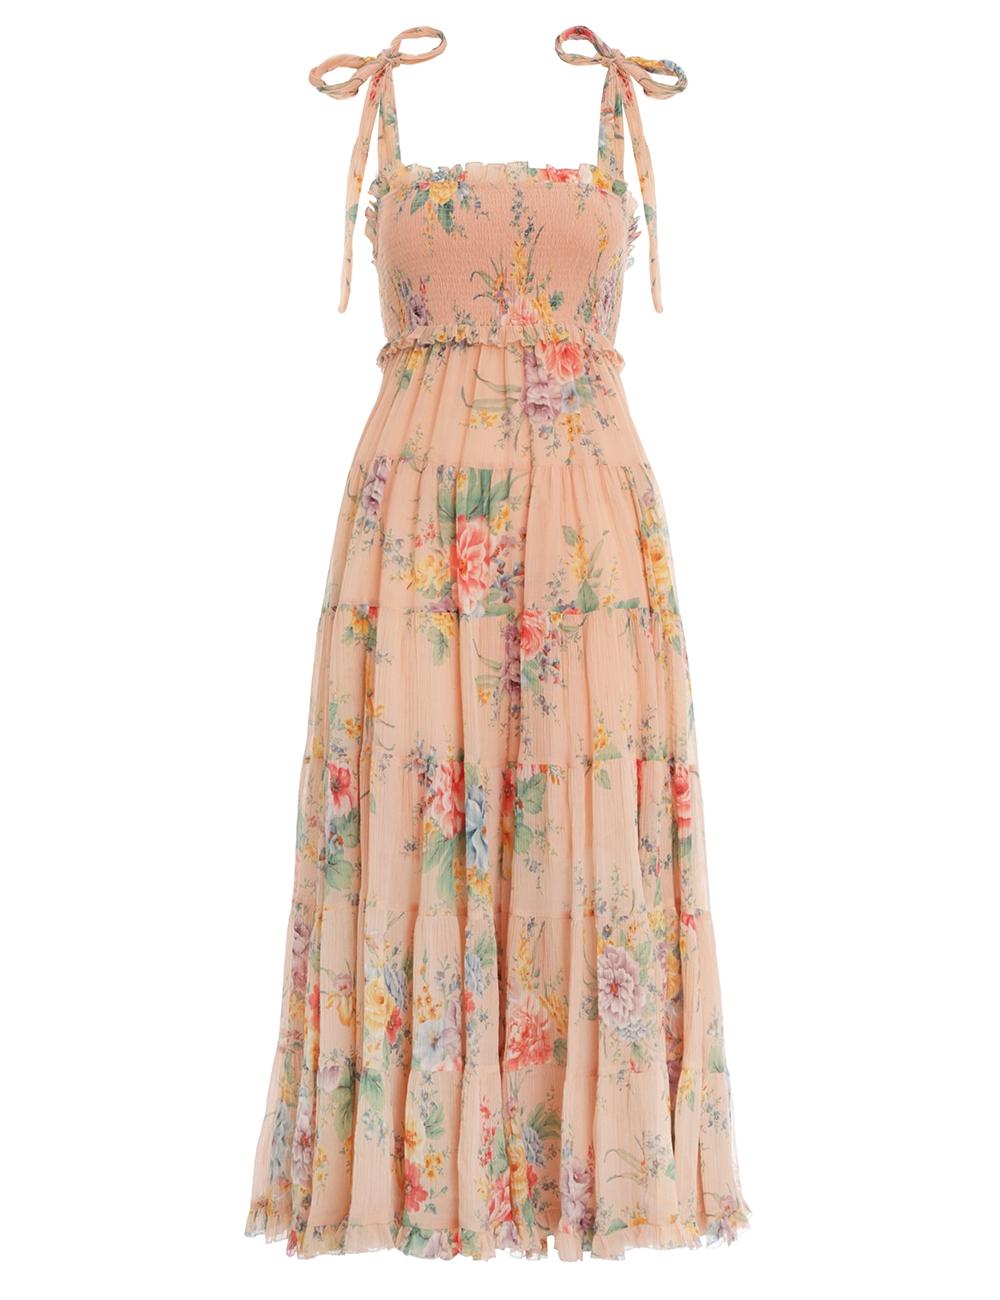 Zinnia Tiered Sun Dress